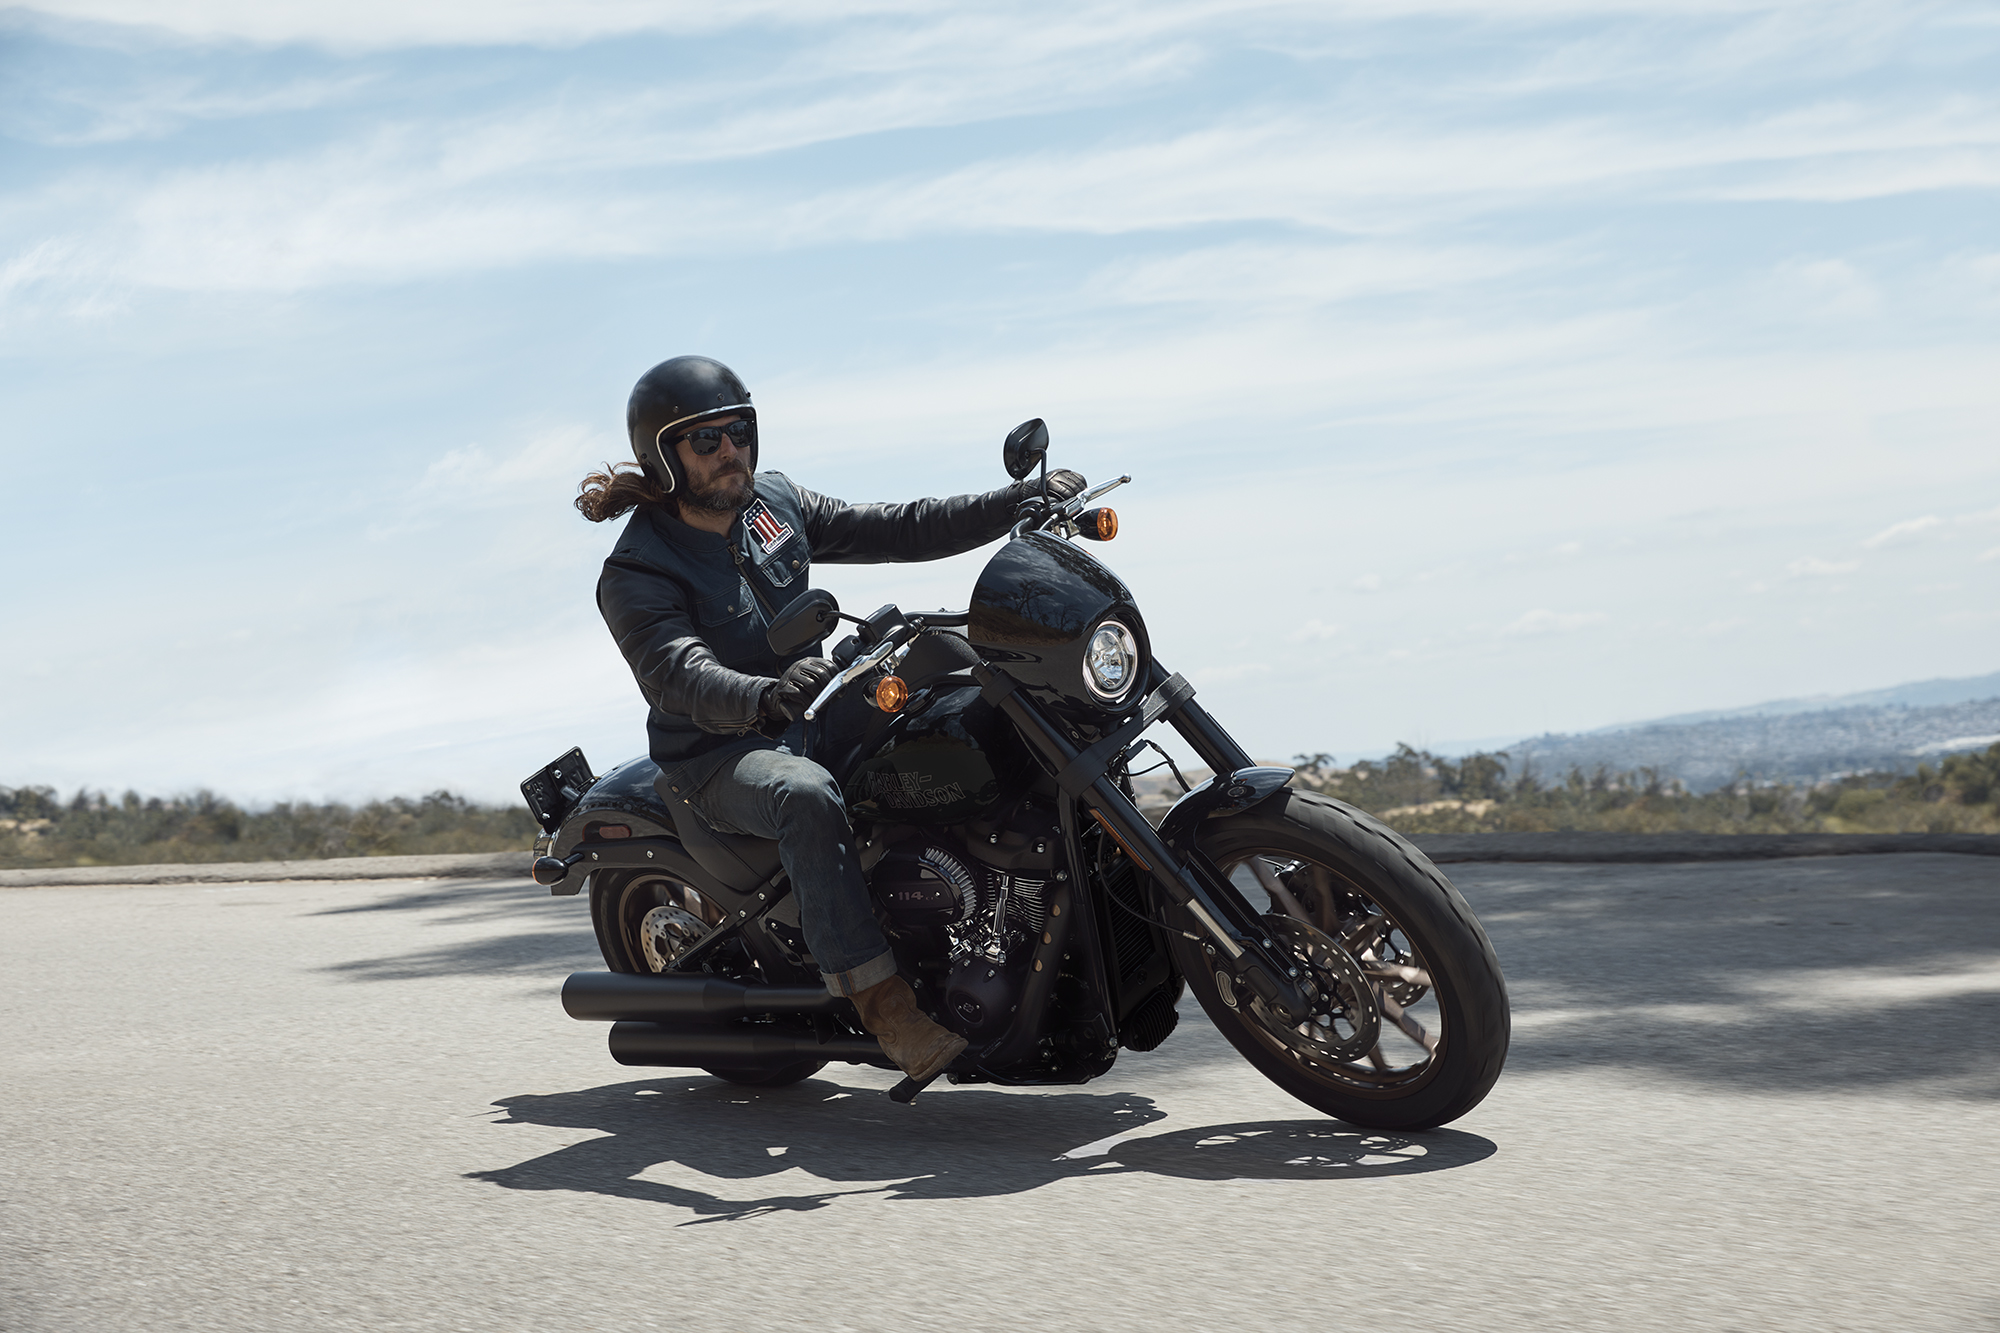 Harley-Davidson do Brasil realiza campanha Orange & Black Tag com ofertas exclusivas